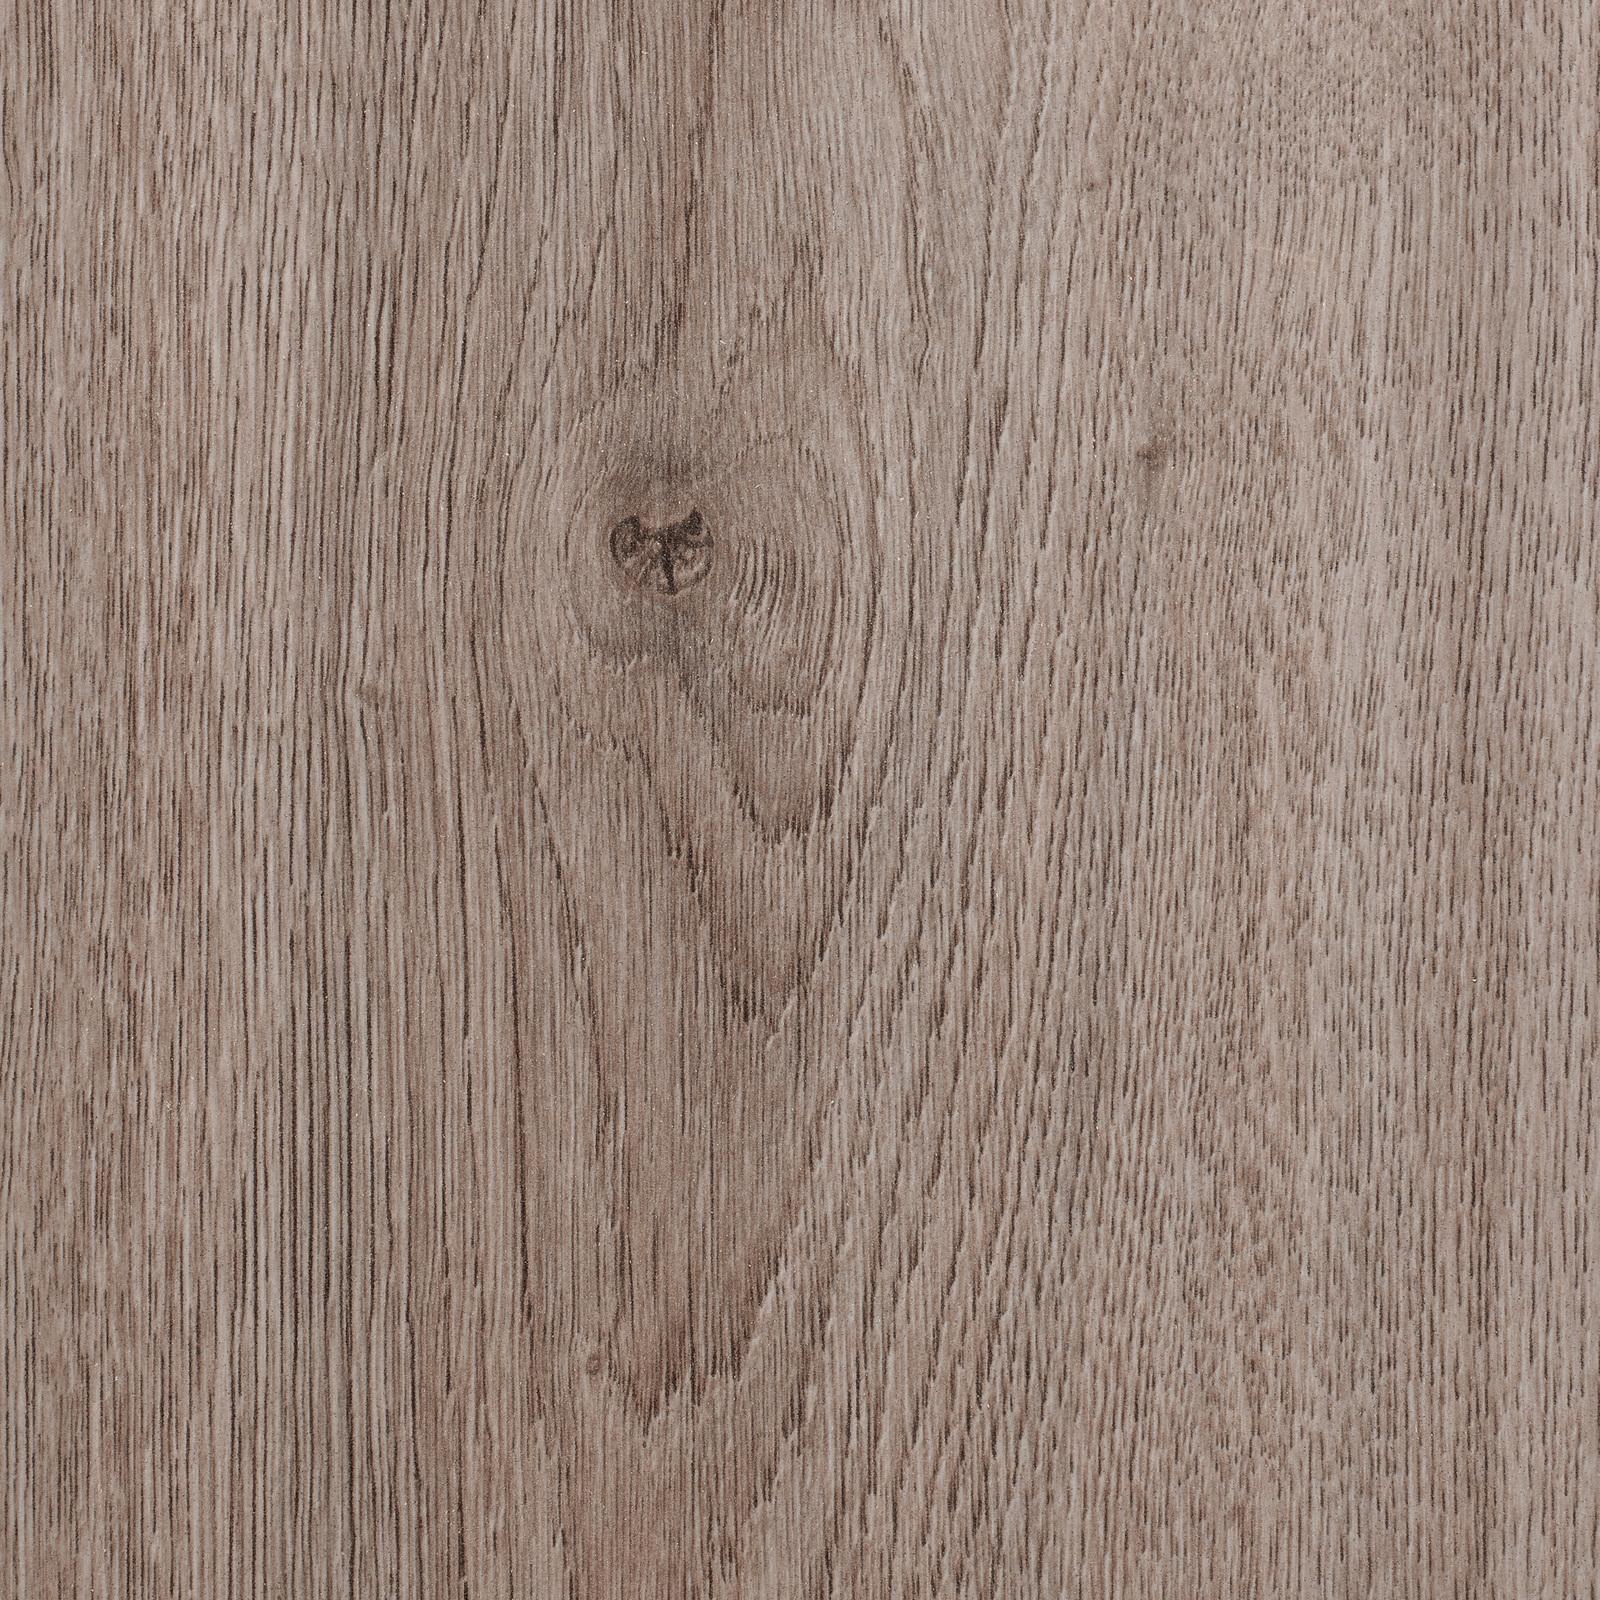 BASIC Laminat Trend Eiche Titan 1-Stab